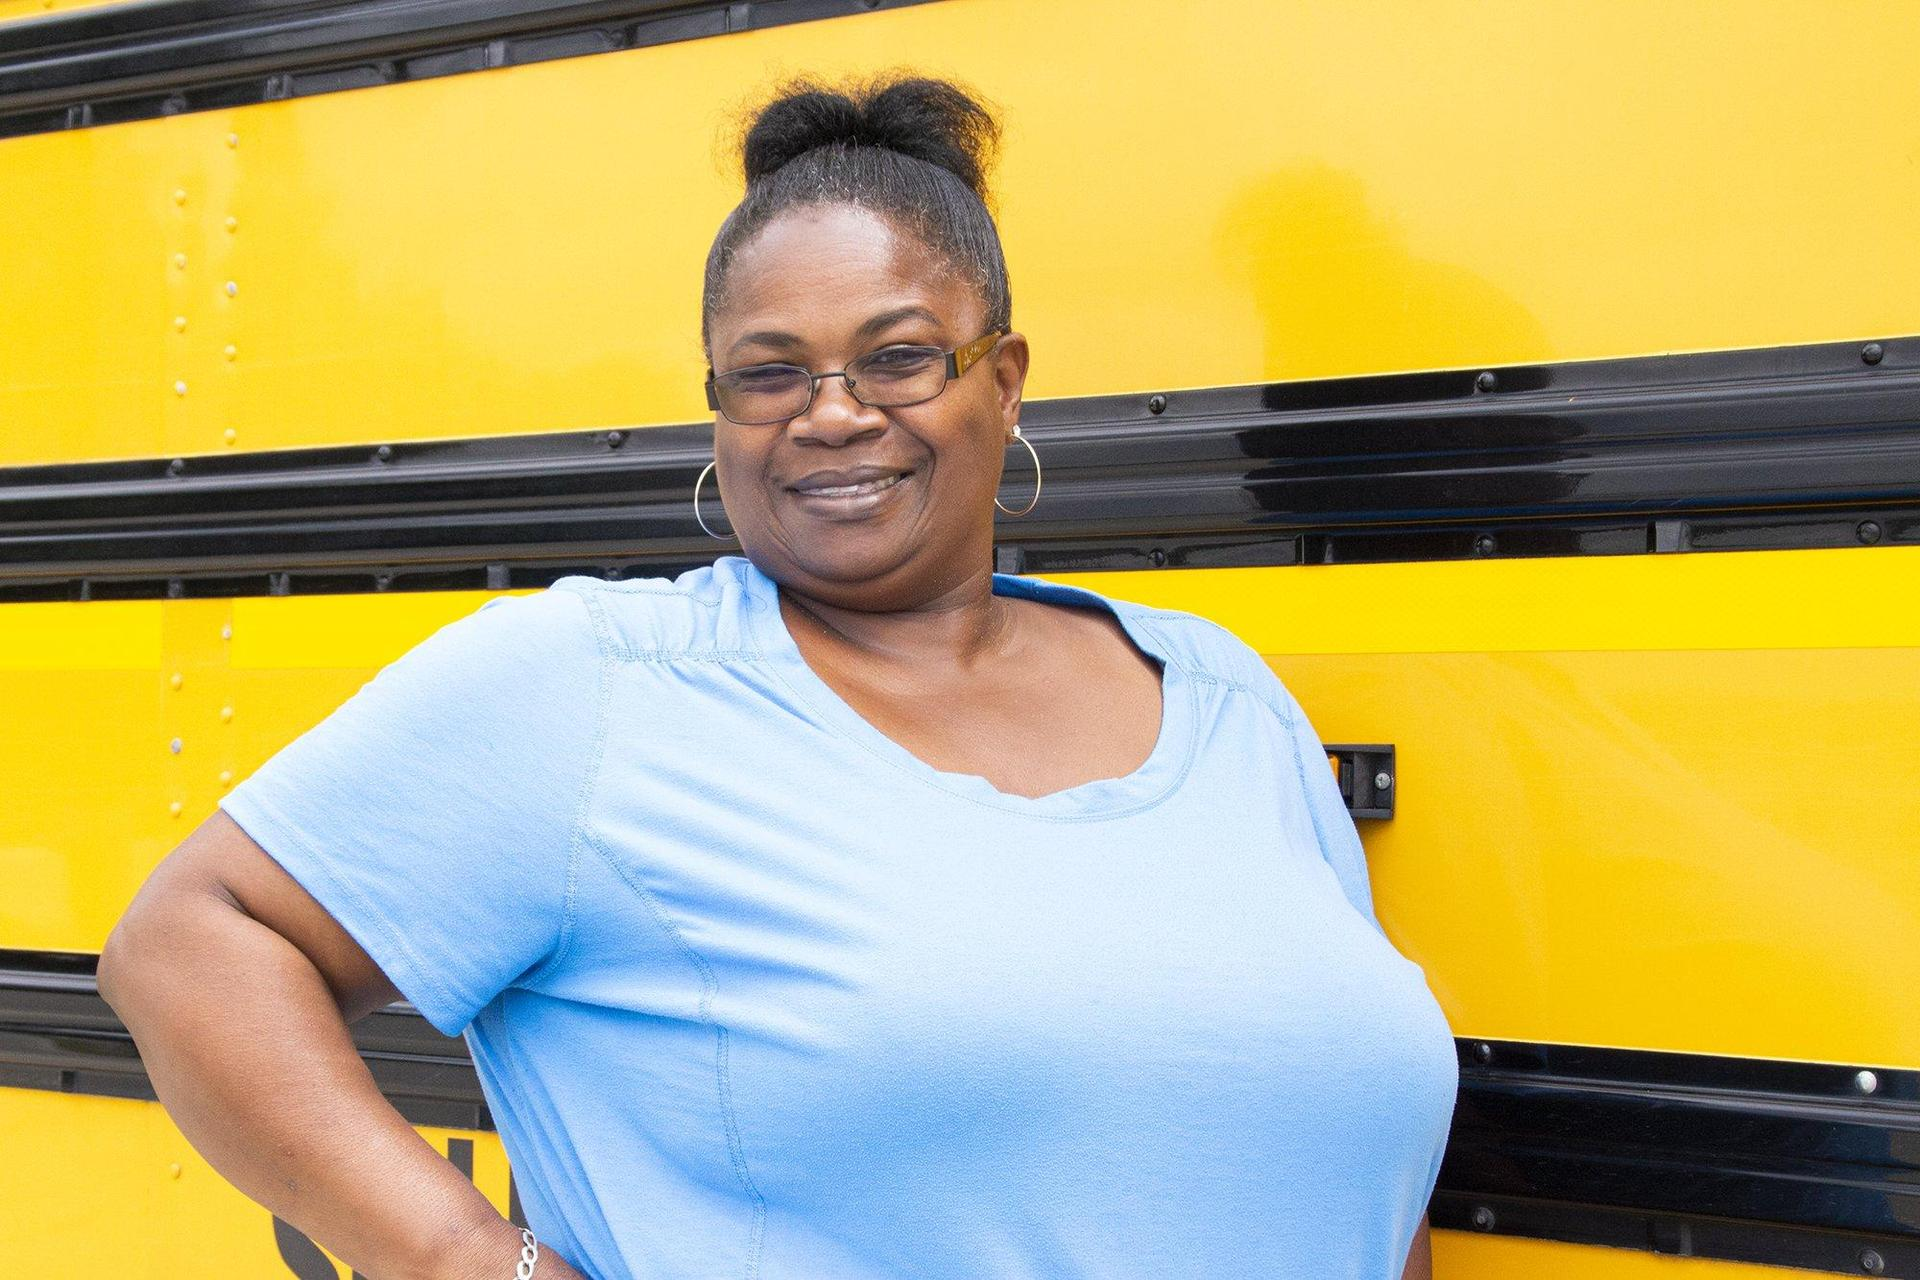 woman standing beside school bus